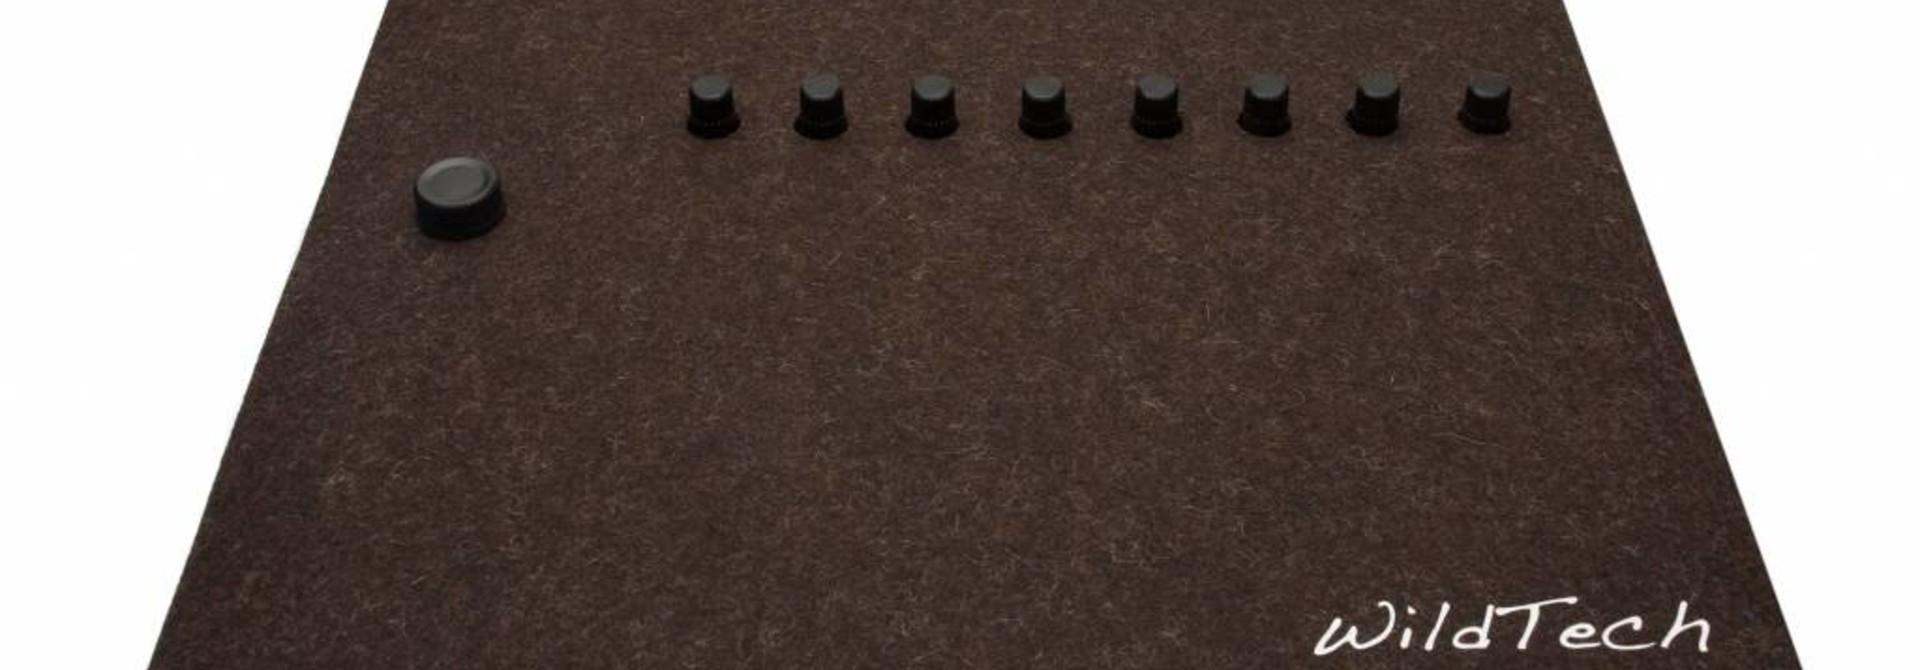 Maschine DeckCover Truffle-Brown